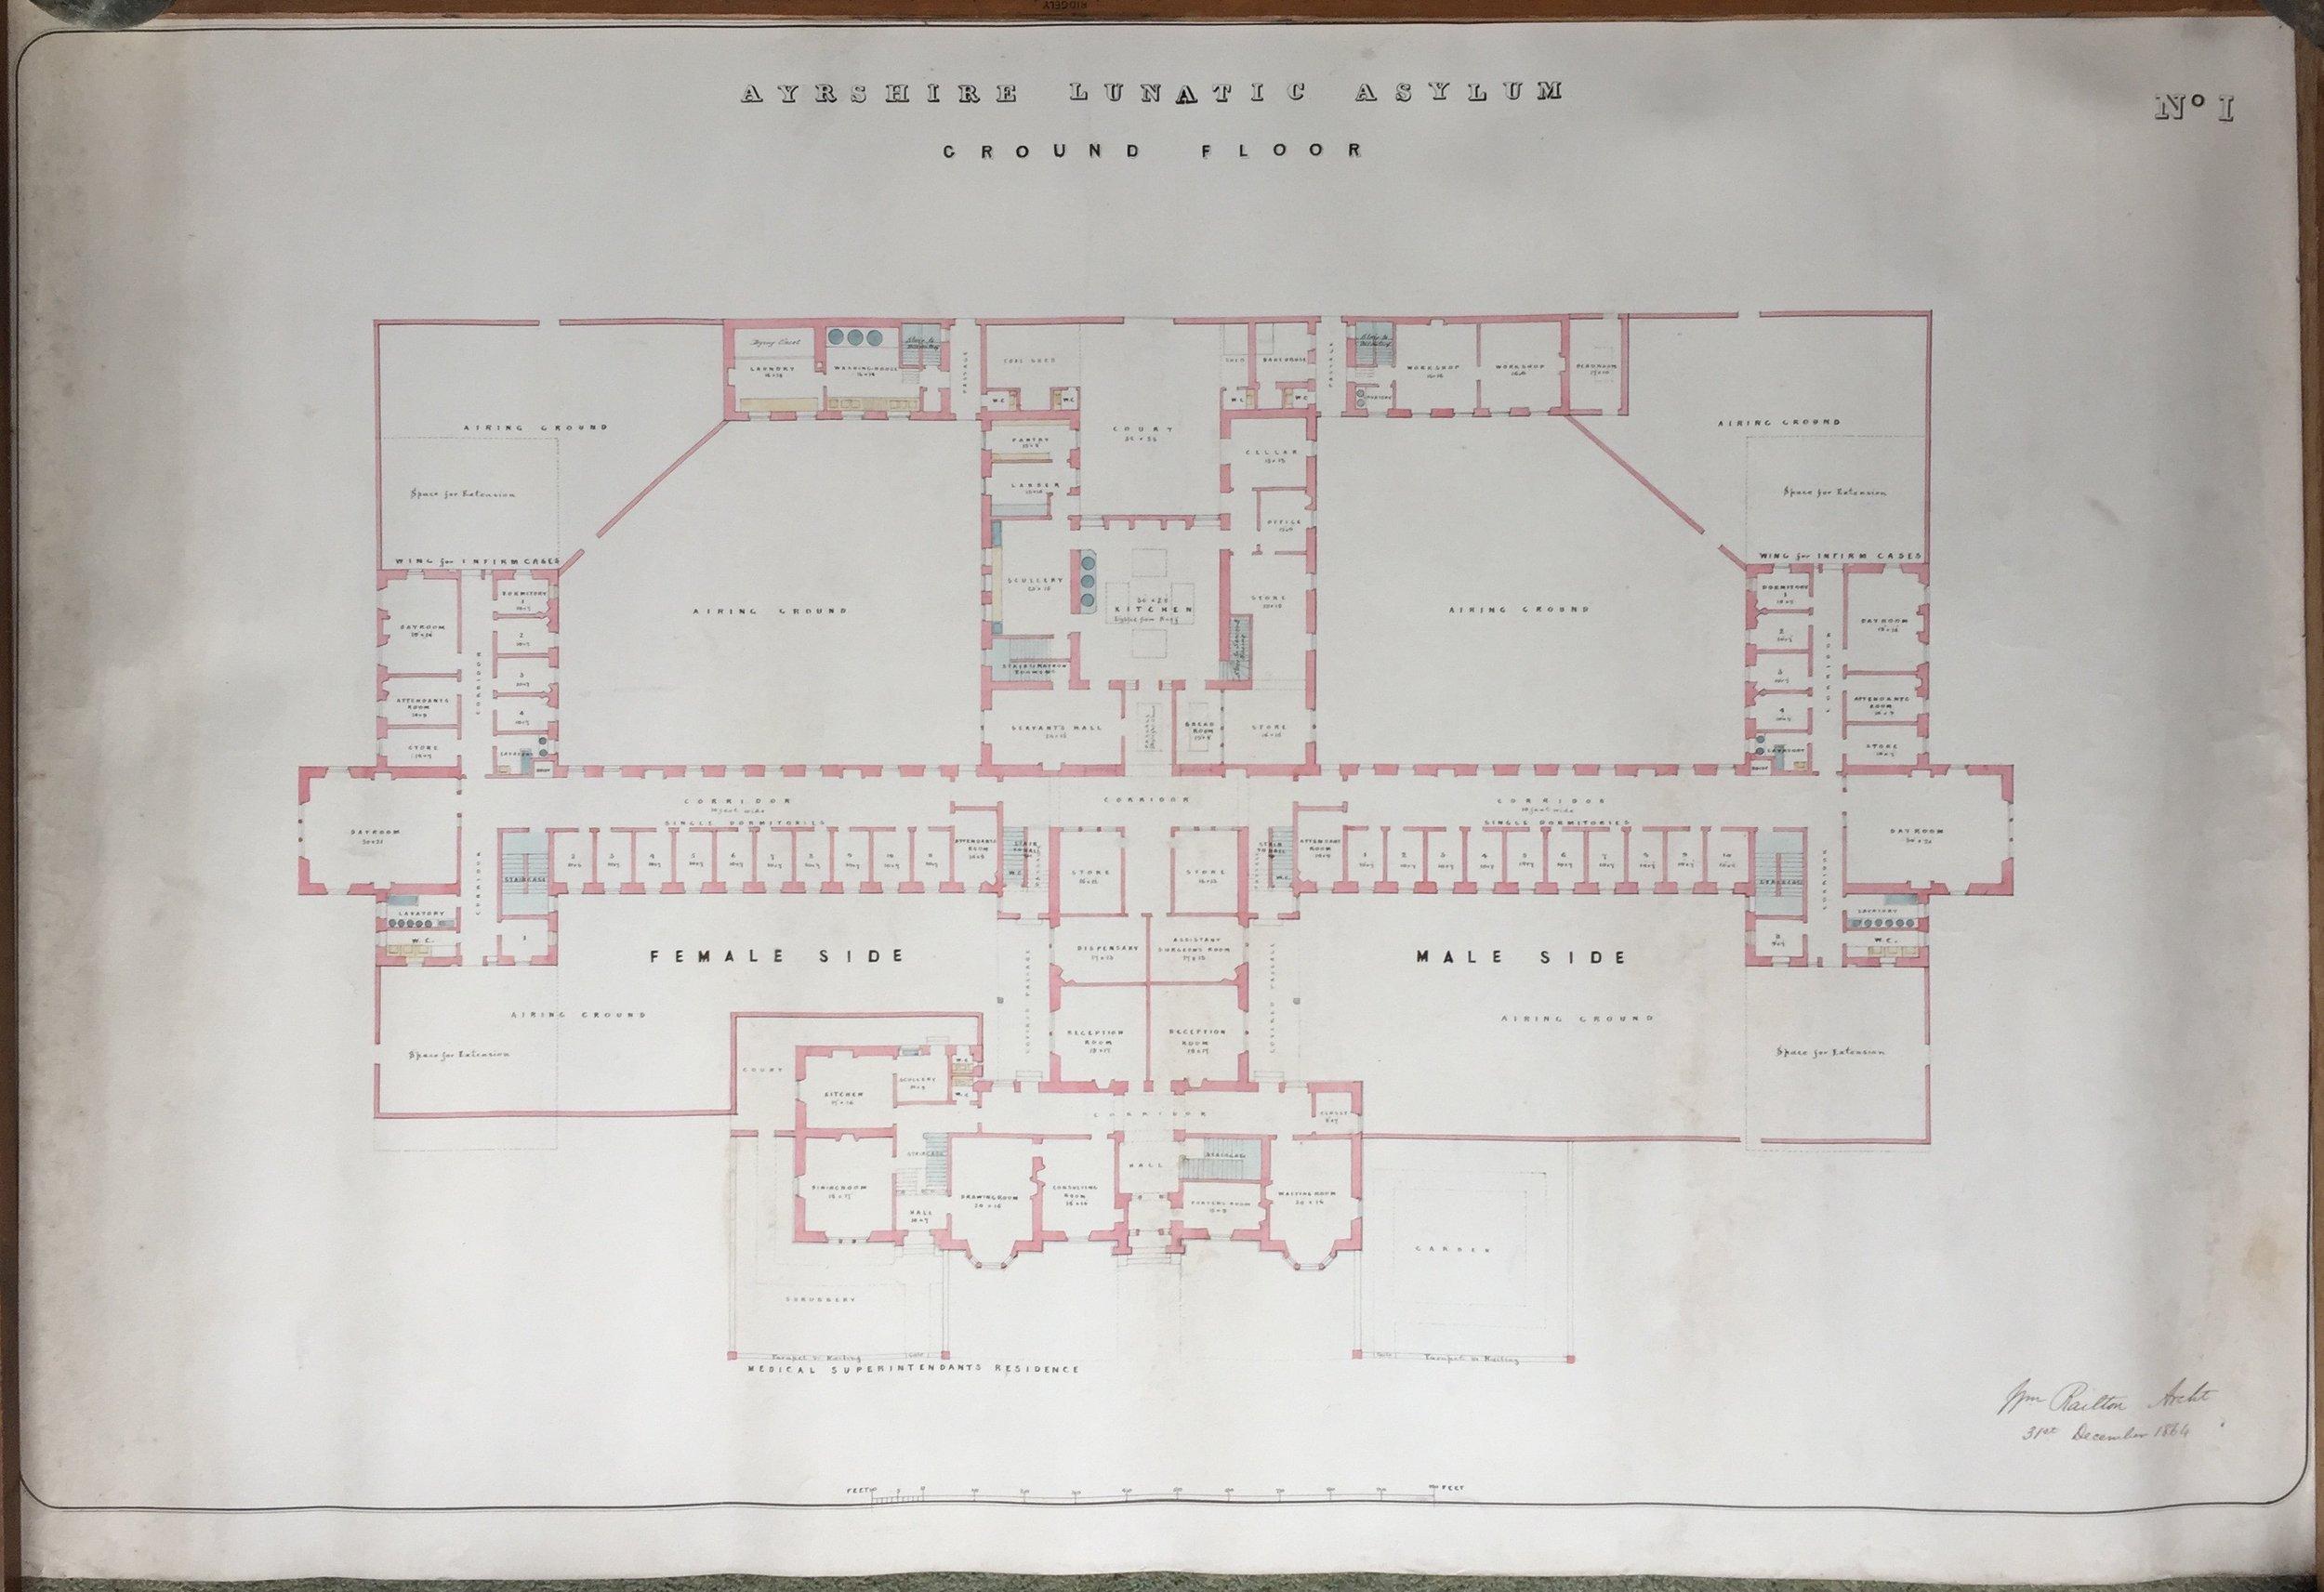 railton_ayrshire-lunatic-asylum-ground-floor_1864.jpg